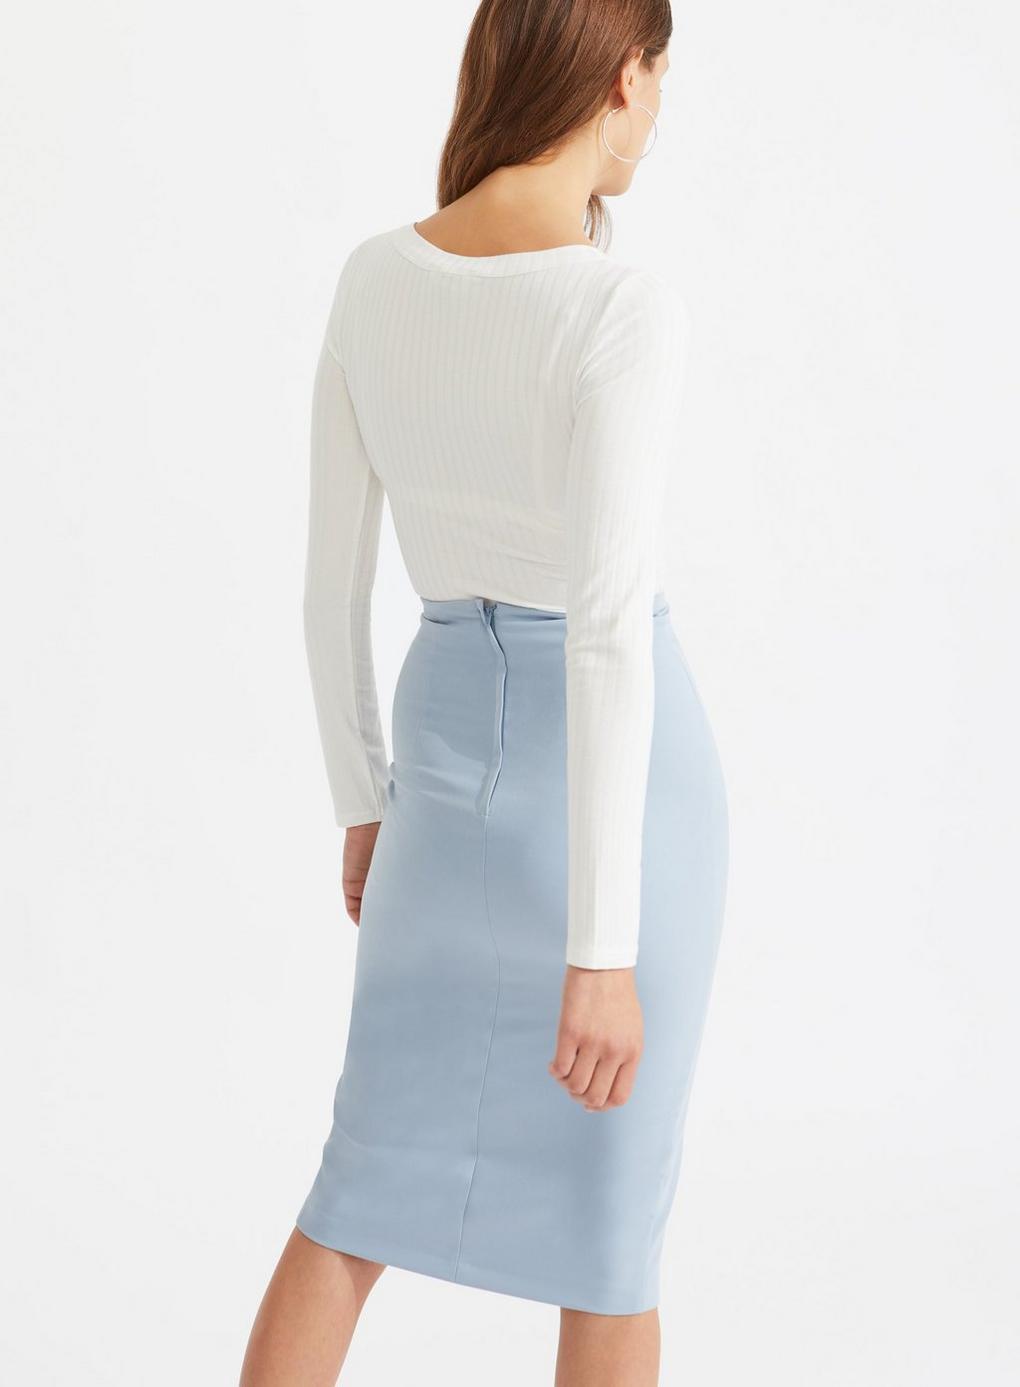 62194956e8029 Miss Selfridge - White Ivory Long Sleeve Horn Button Top - Lyst. View  fullscreen